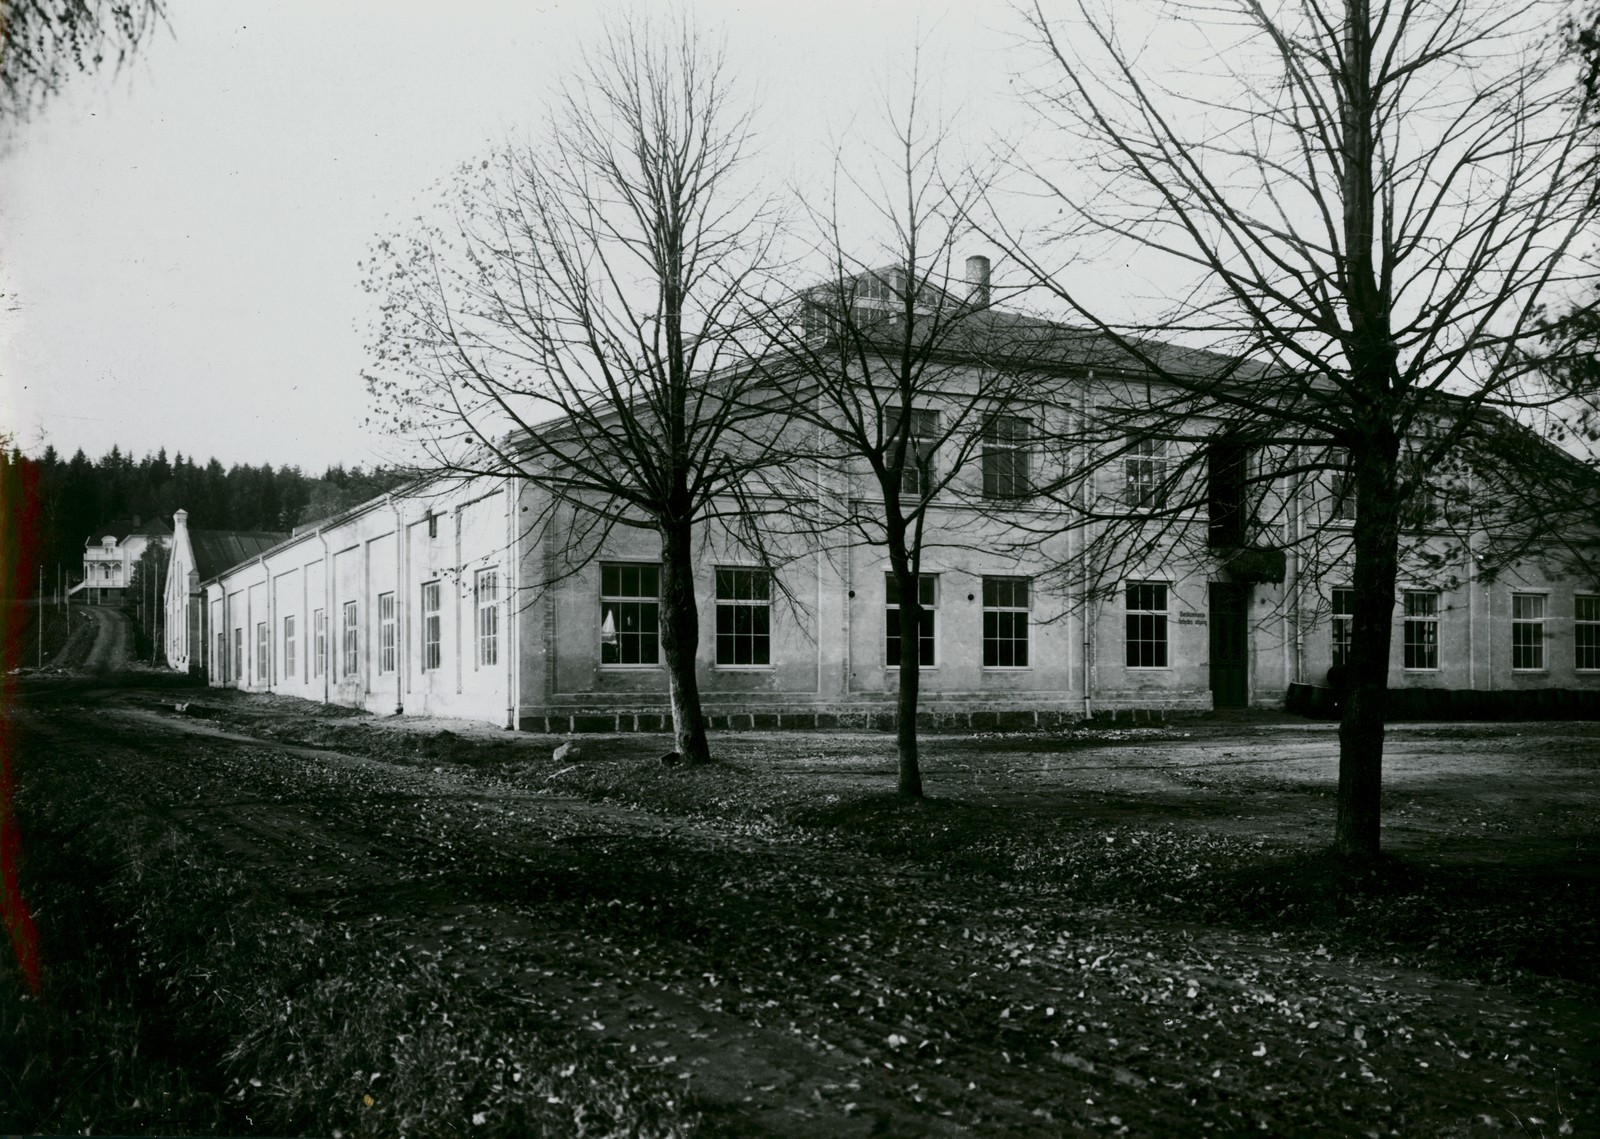 Bygning mur 1911-1